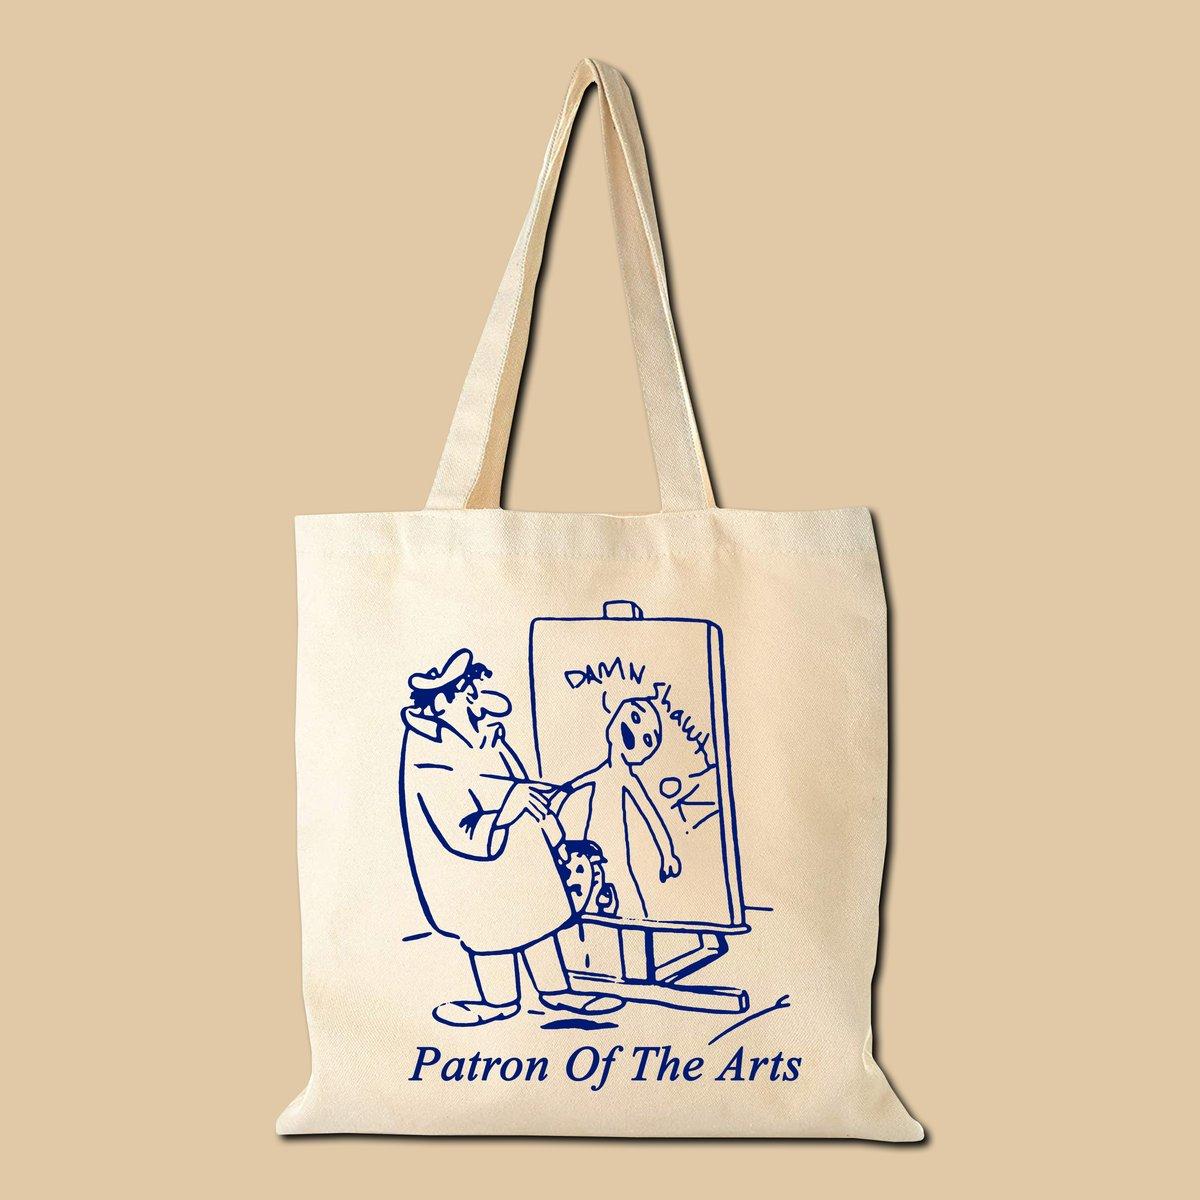 PATRON OF THE ARTS